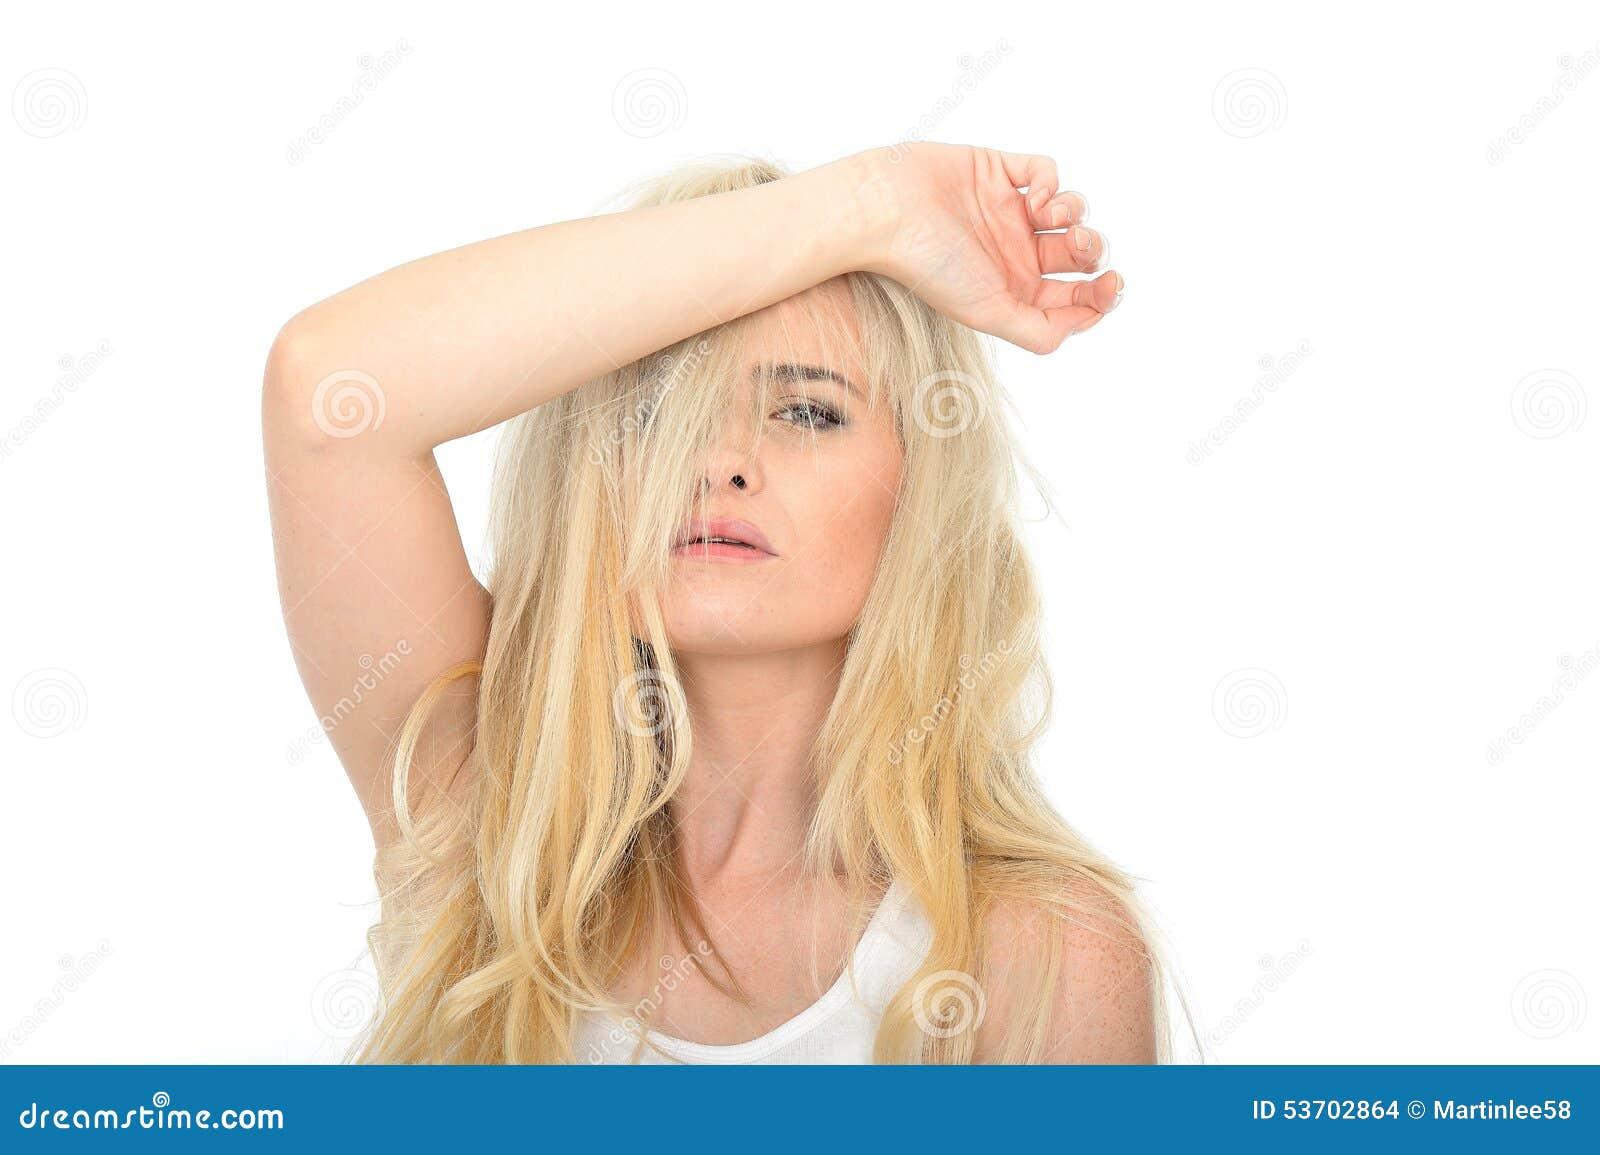 Jeune femme malheureuse soumise à une contrainte attirante semblant fatiguée et frustrante